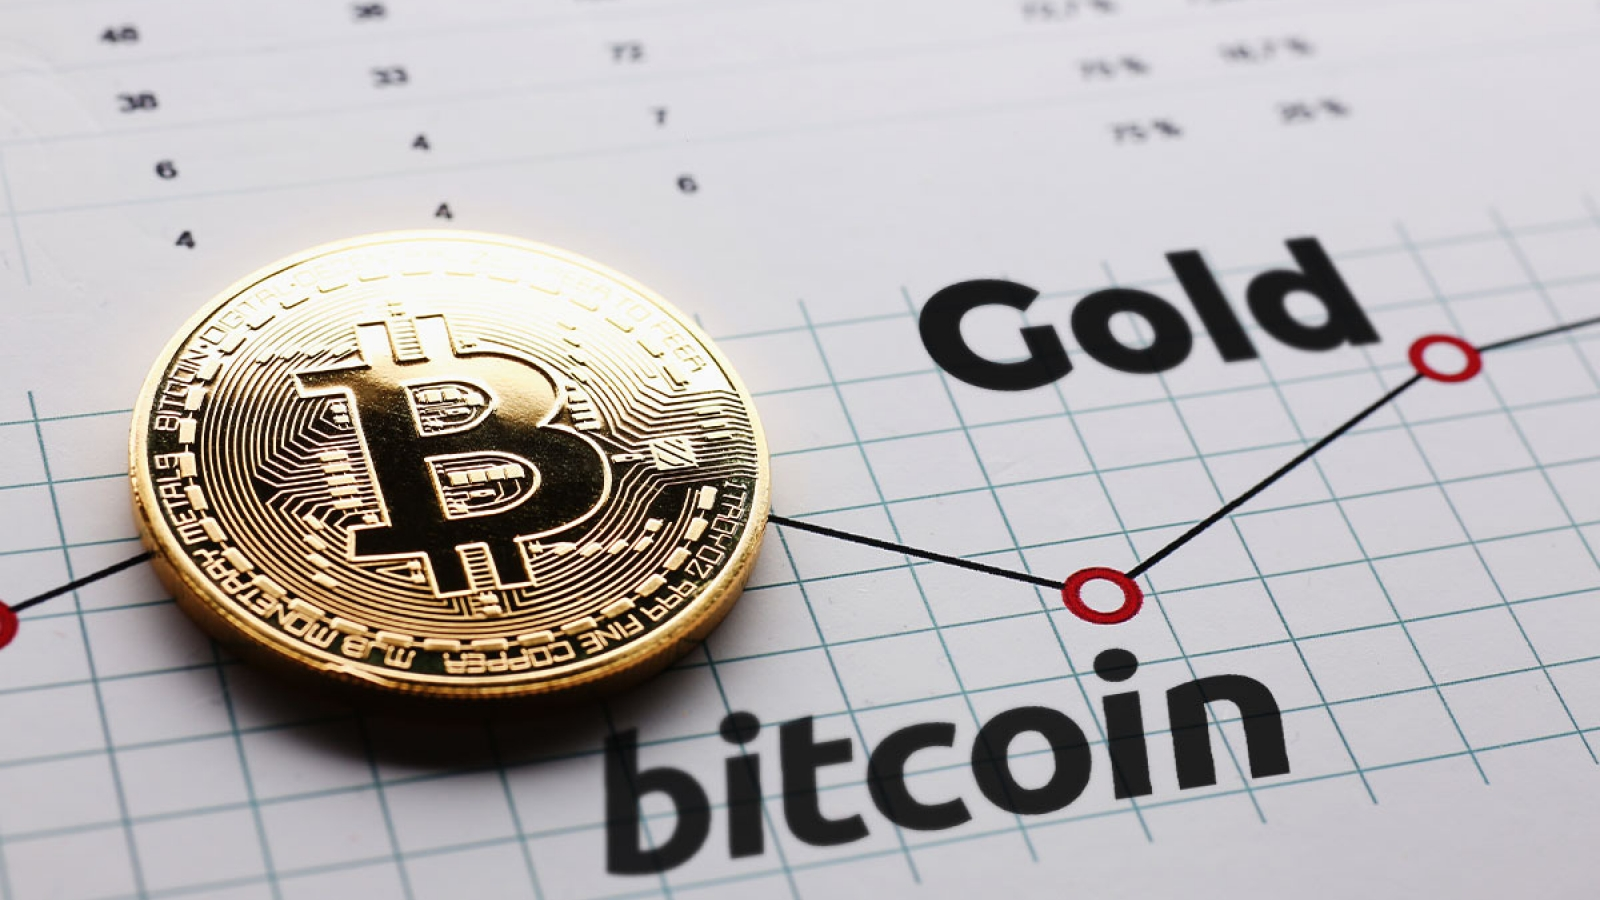 Bitcoin'de İlk Hedef 15.000 Dolarken İkinci Hedef 24.000 Dolar